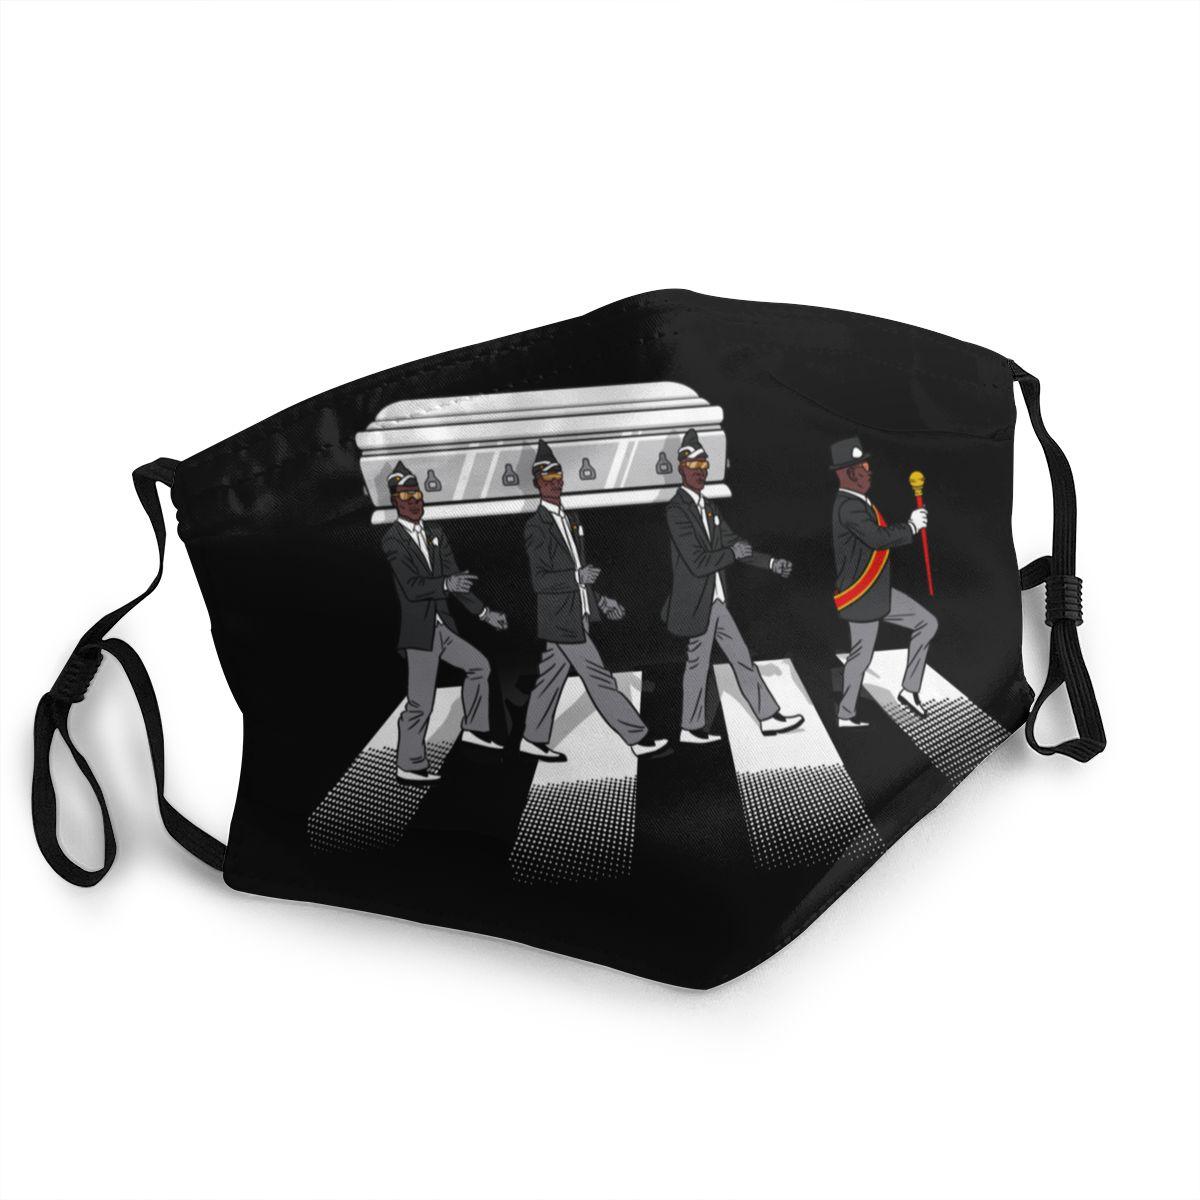 Coffin Dance Funeral Casket Pallbearers Reusable Face Mask Rip Africa Music Dancer Anti Haze Dust Protection Cover Respirator